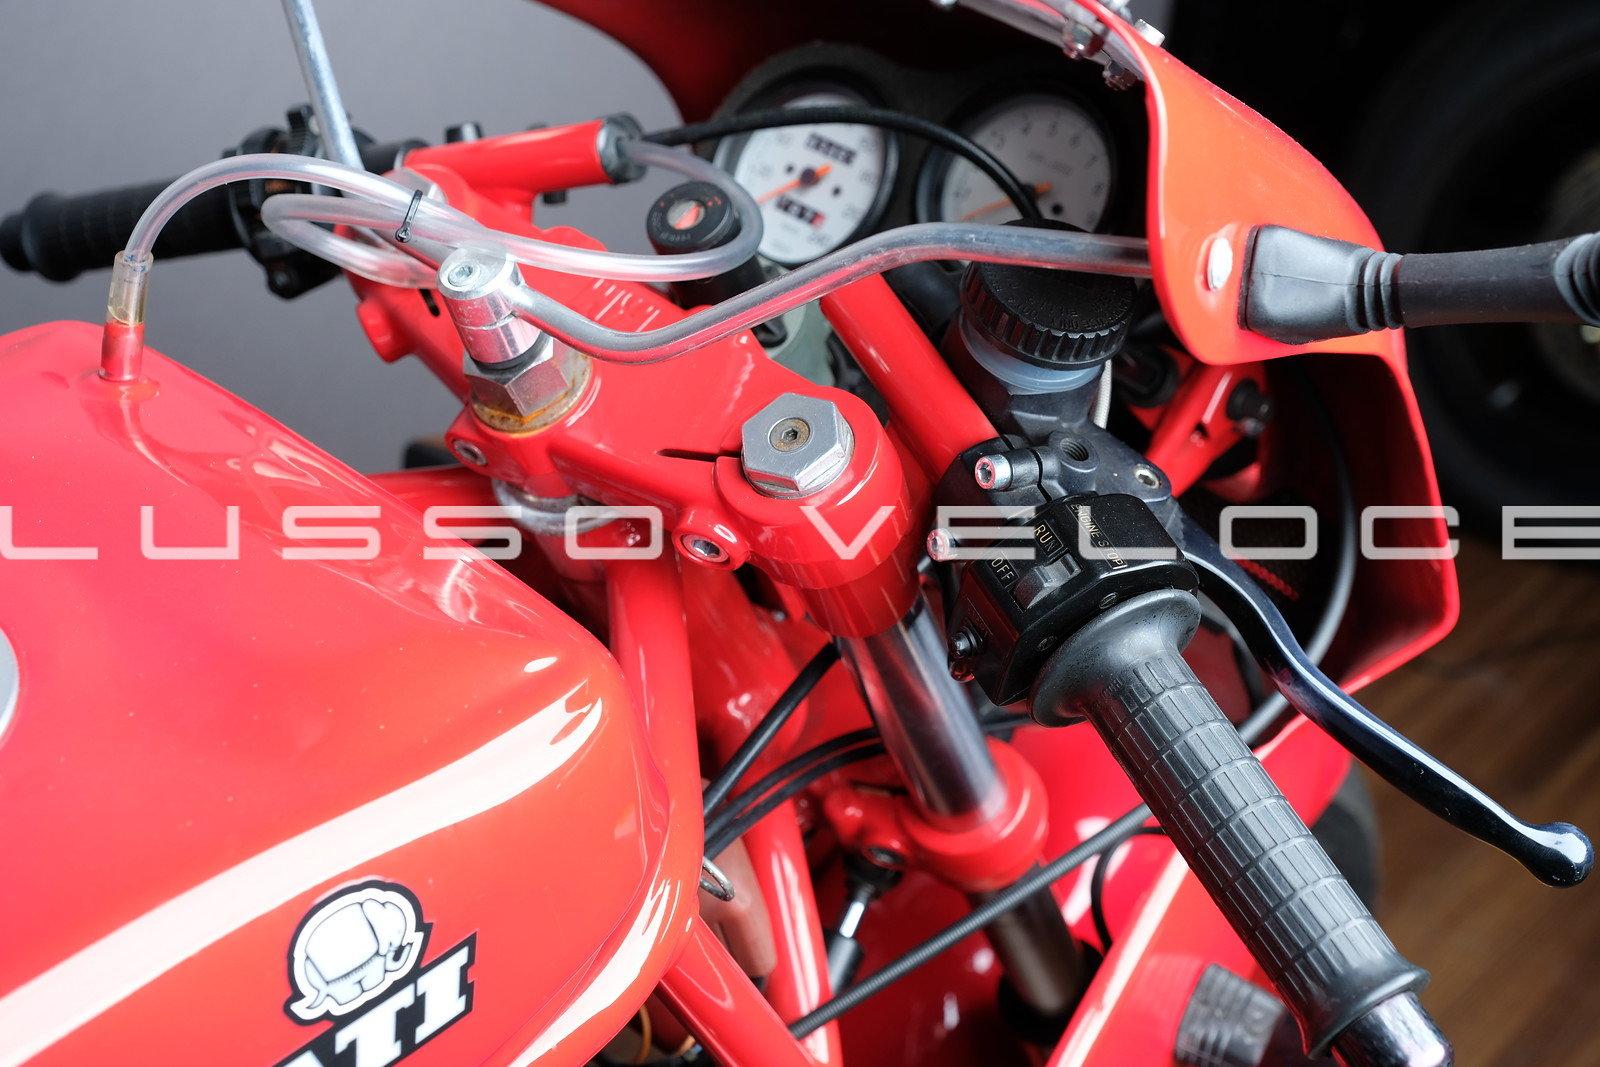 1986 Rare Ducati F3 350 fully restored For Sale (picture 8 of 15)